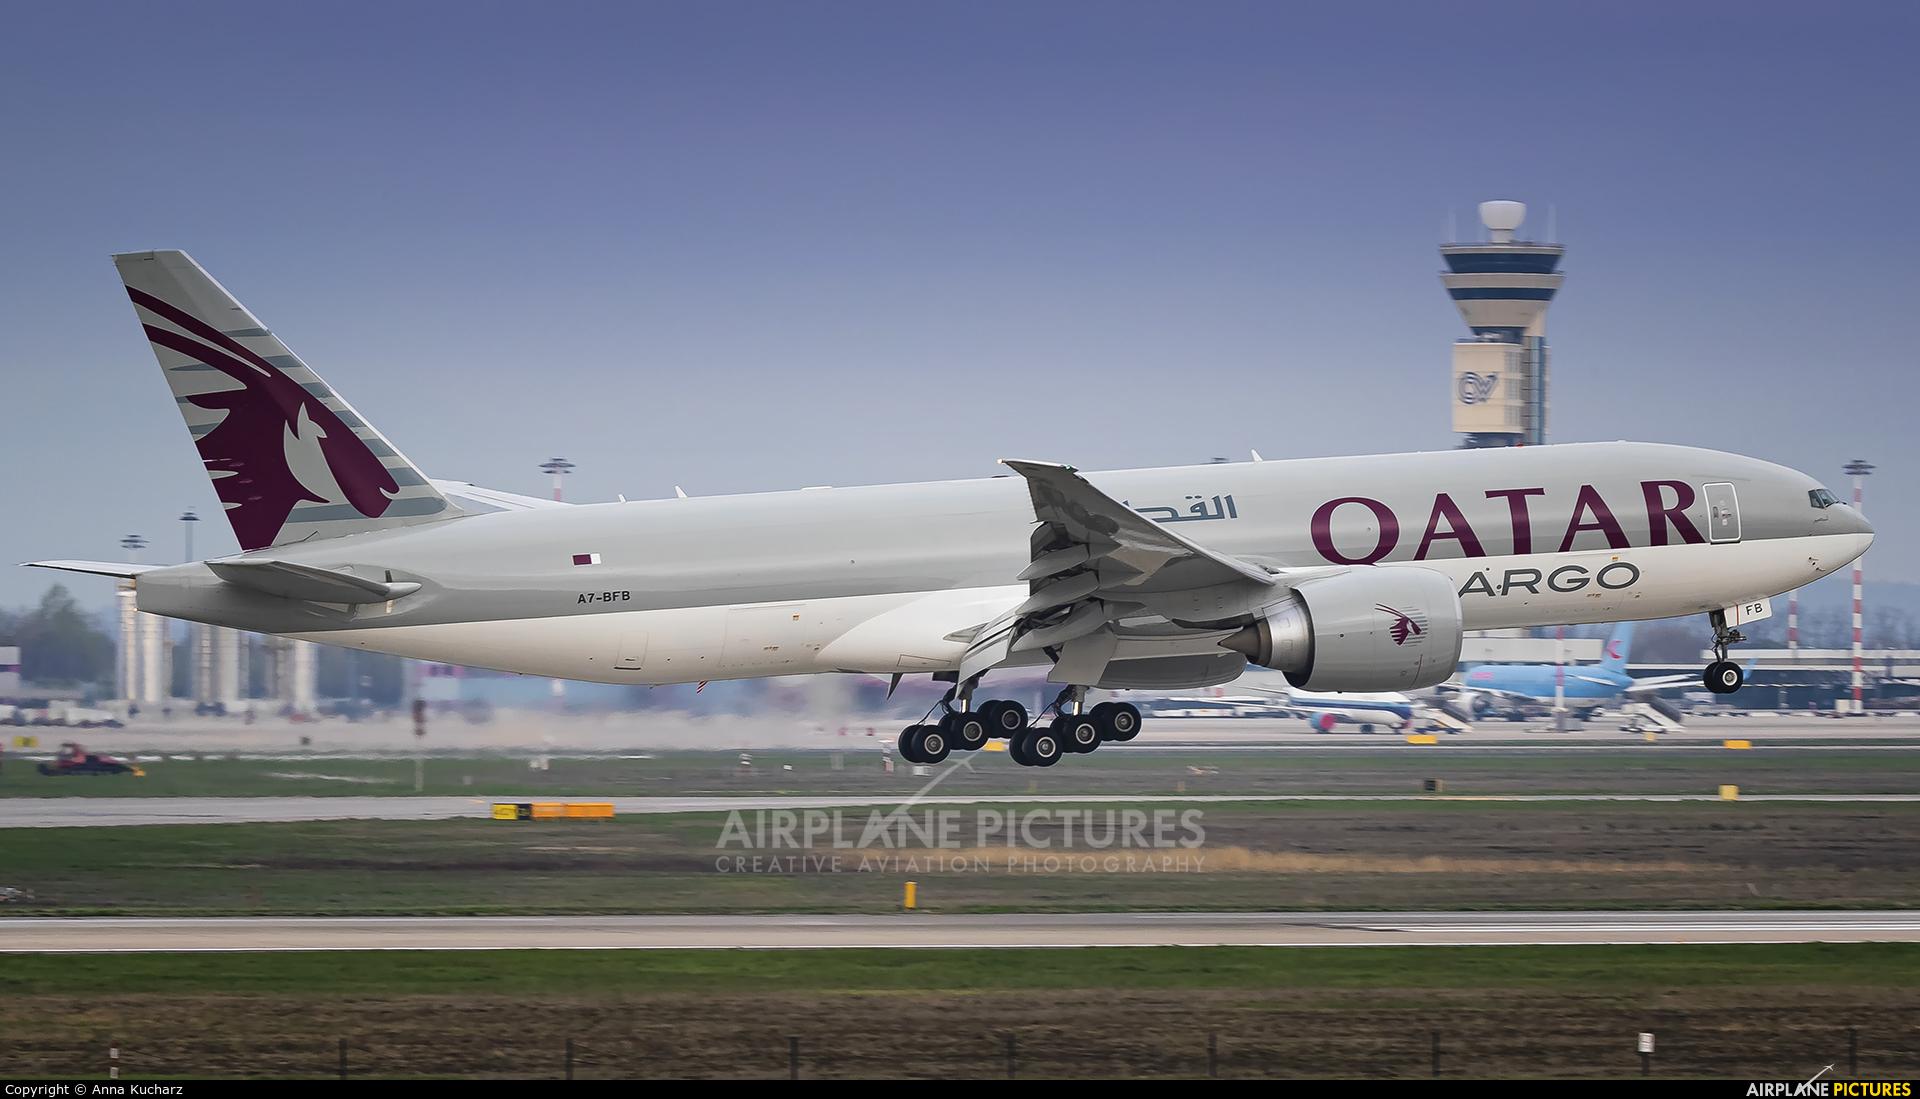 Qatar Airways Cargo A7-BFB aircraft at Milan - Malpensa